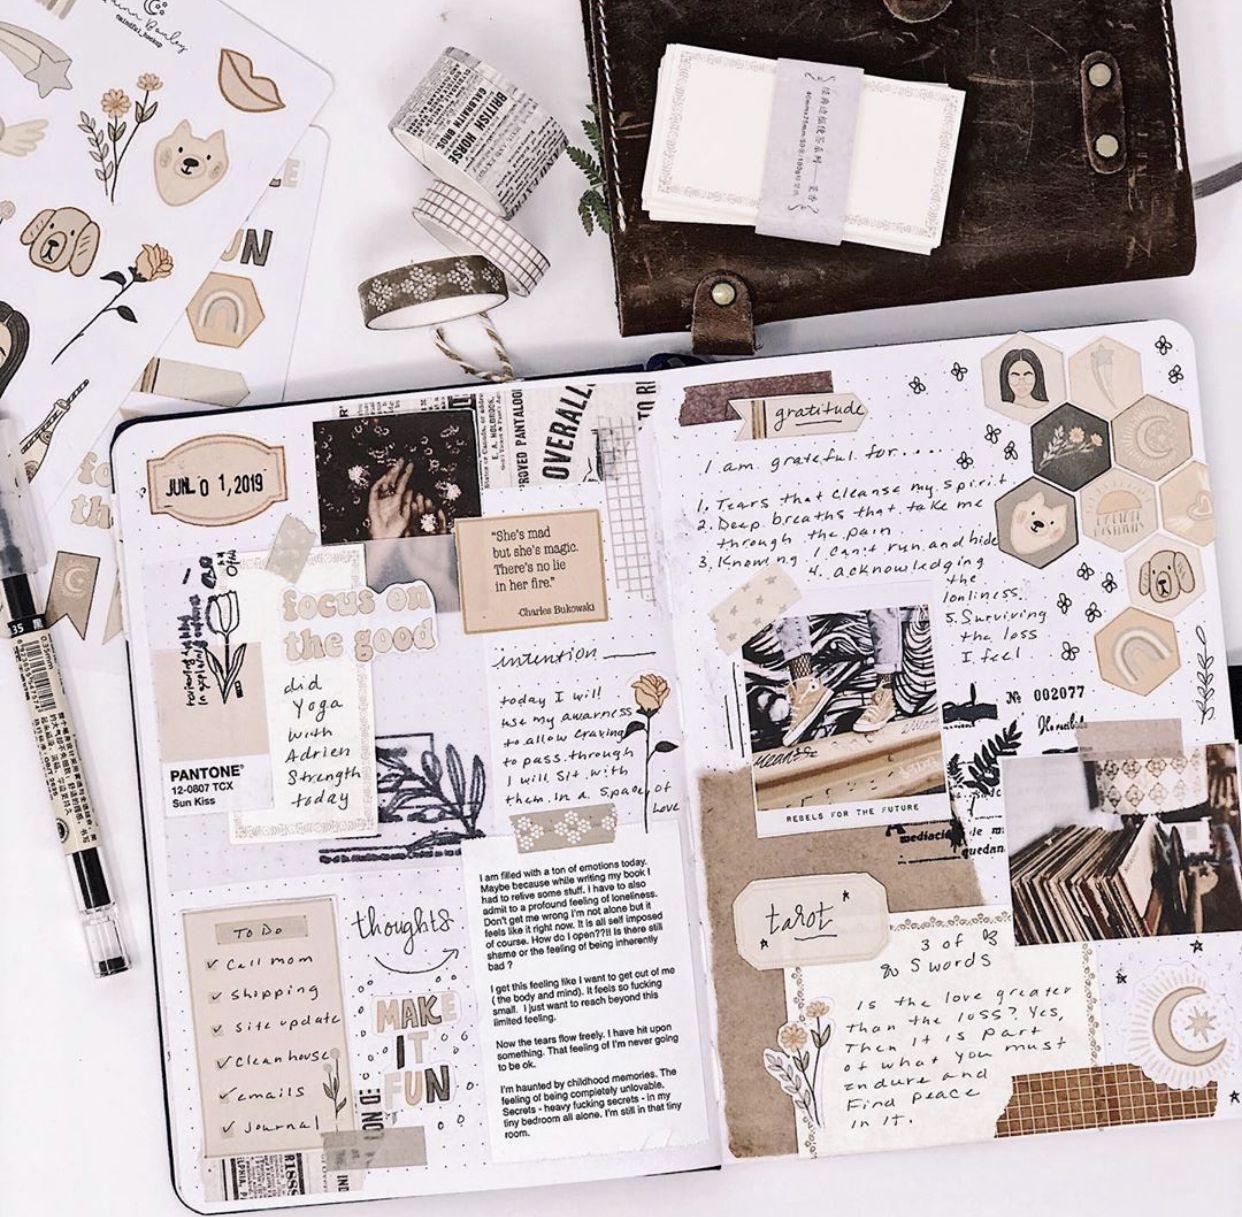 Vague Scrapbook Kits Texture #scrapbookingminsk #FreeScrapbookingSoftware